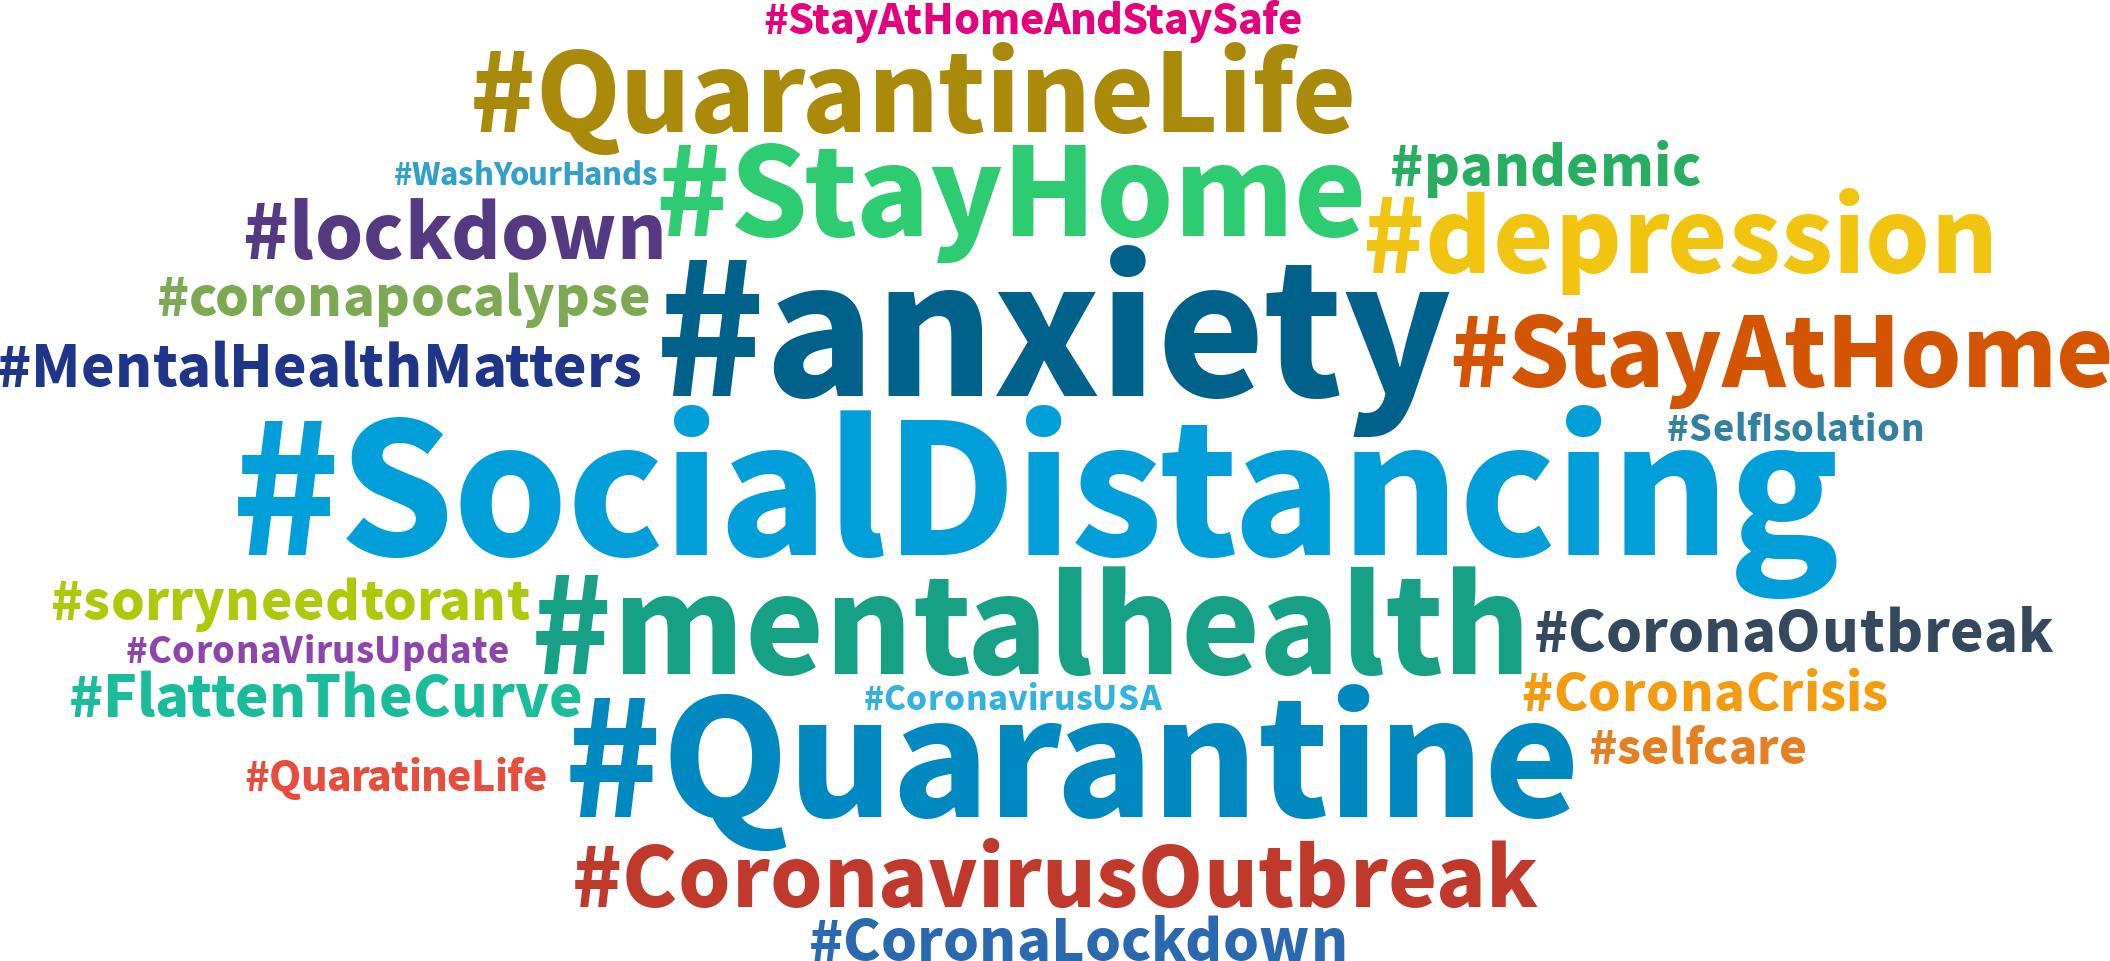 Top March Hashtags in Negative Feelings